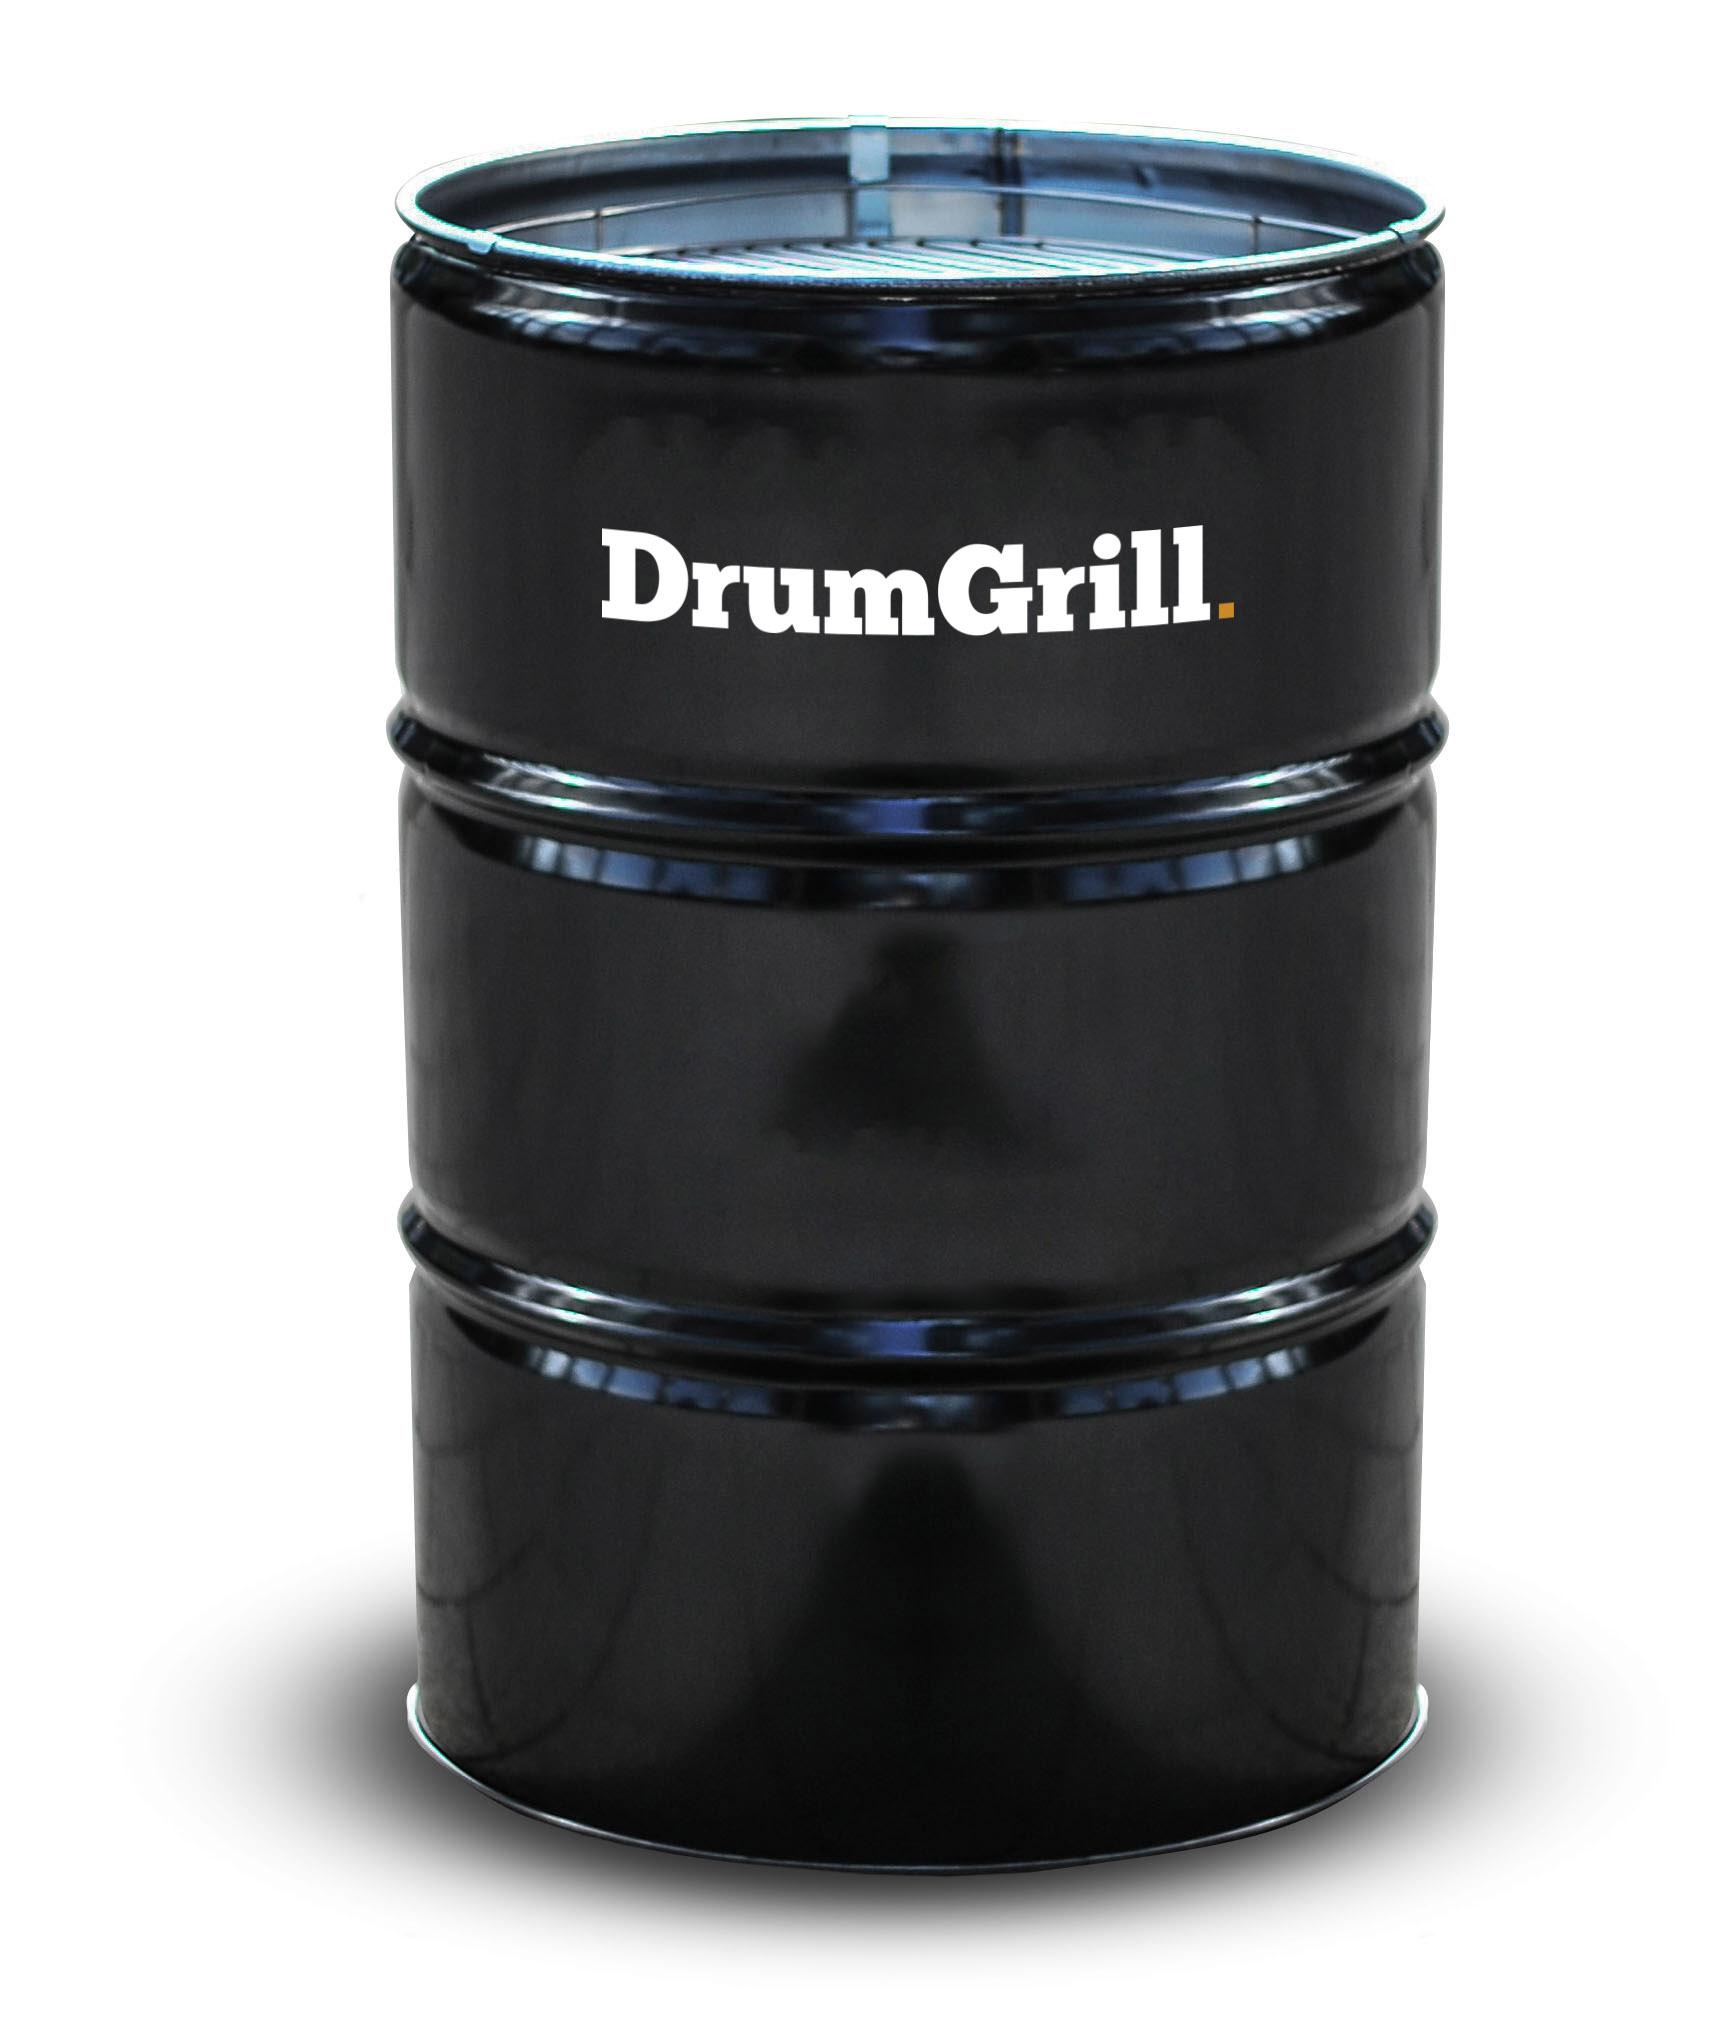 Drumgrill Drumgrill Big 200 Liter Barbecue, vuurkorf en statafel in n